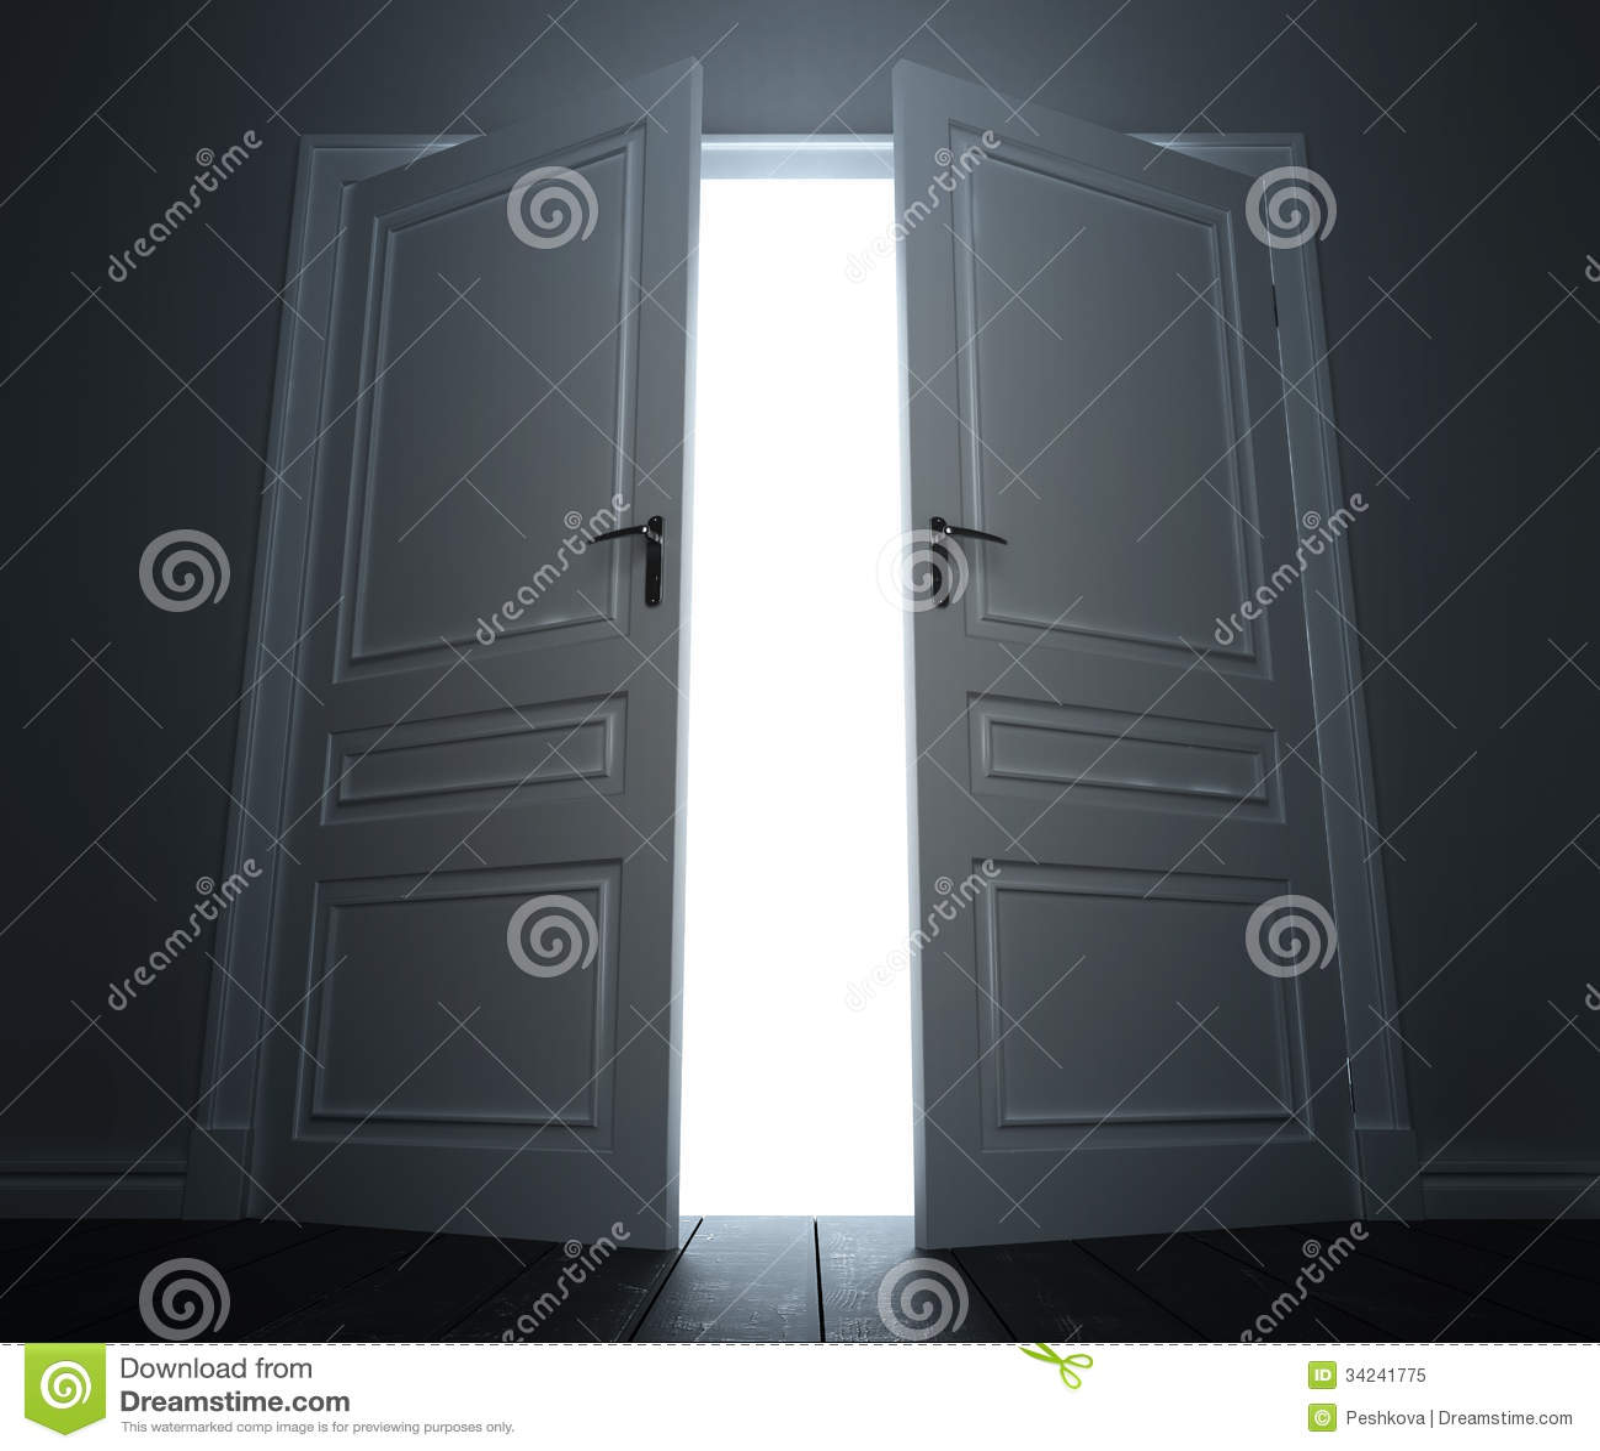 Big Door Royalty Free Stock Photo - Image: 34241775